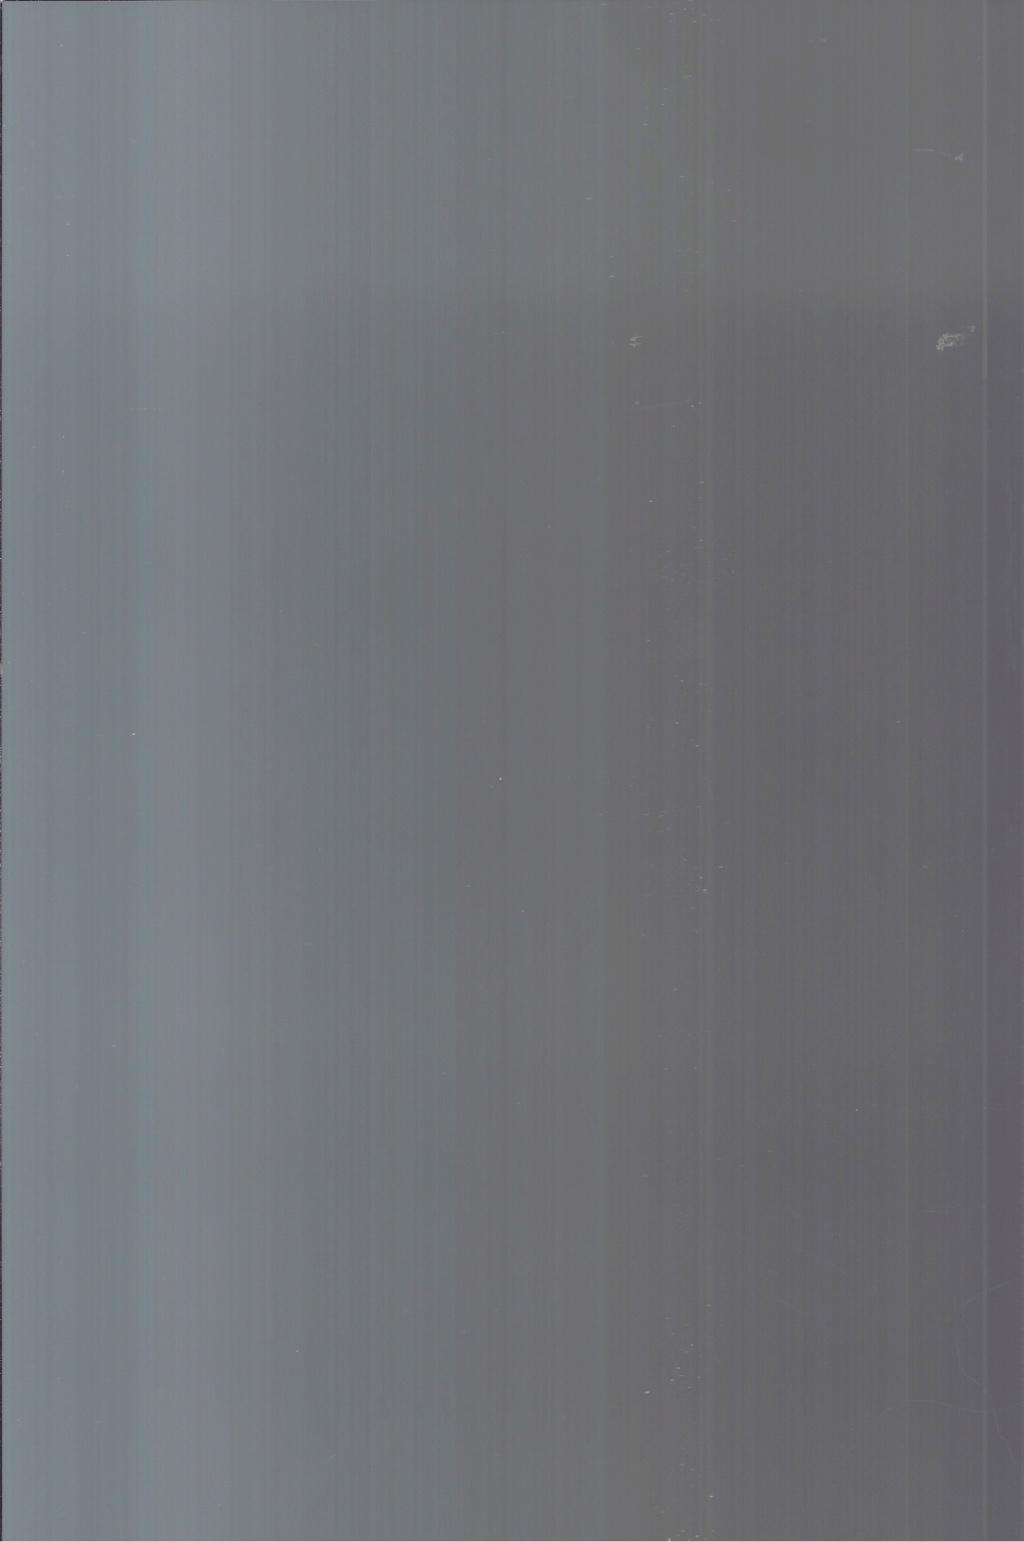 [AIRFIX 2013] Catalogue 2013 Airf1766